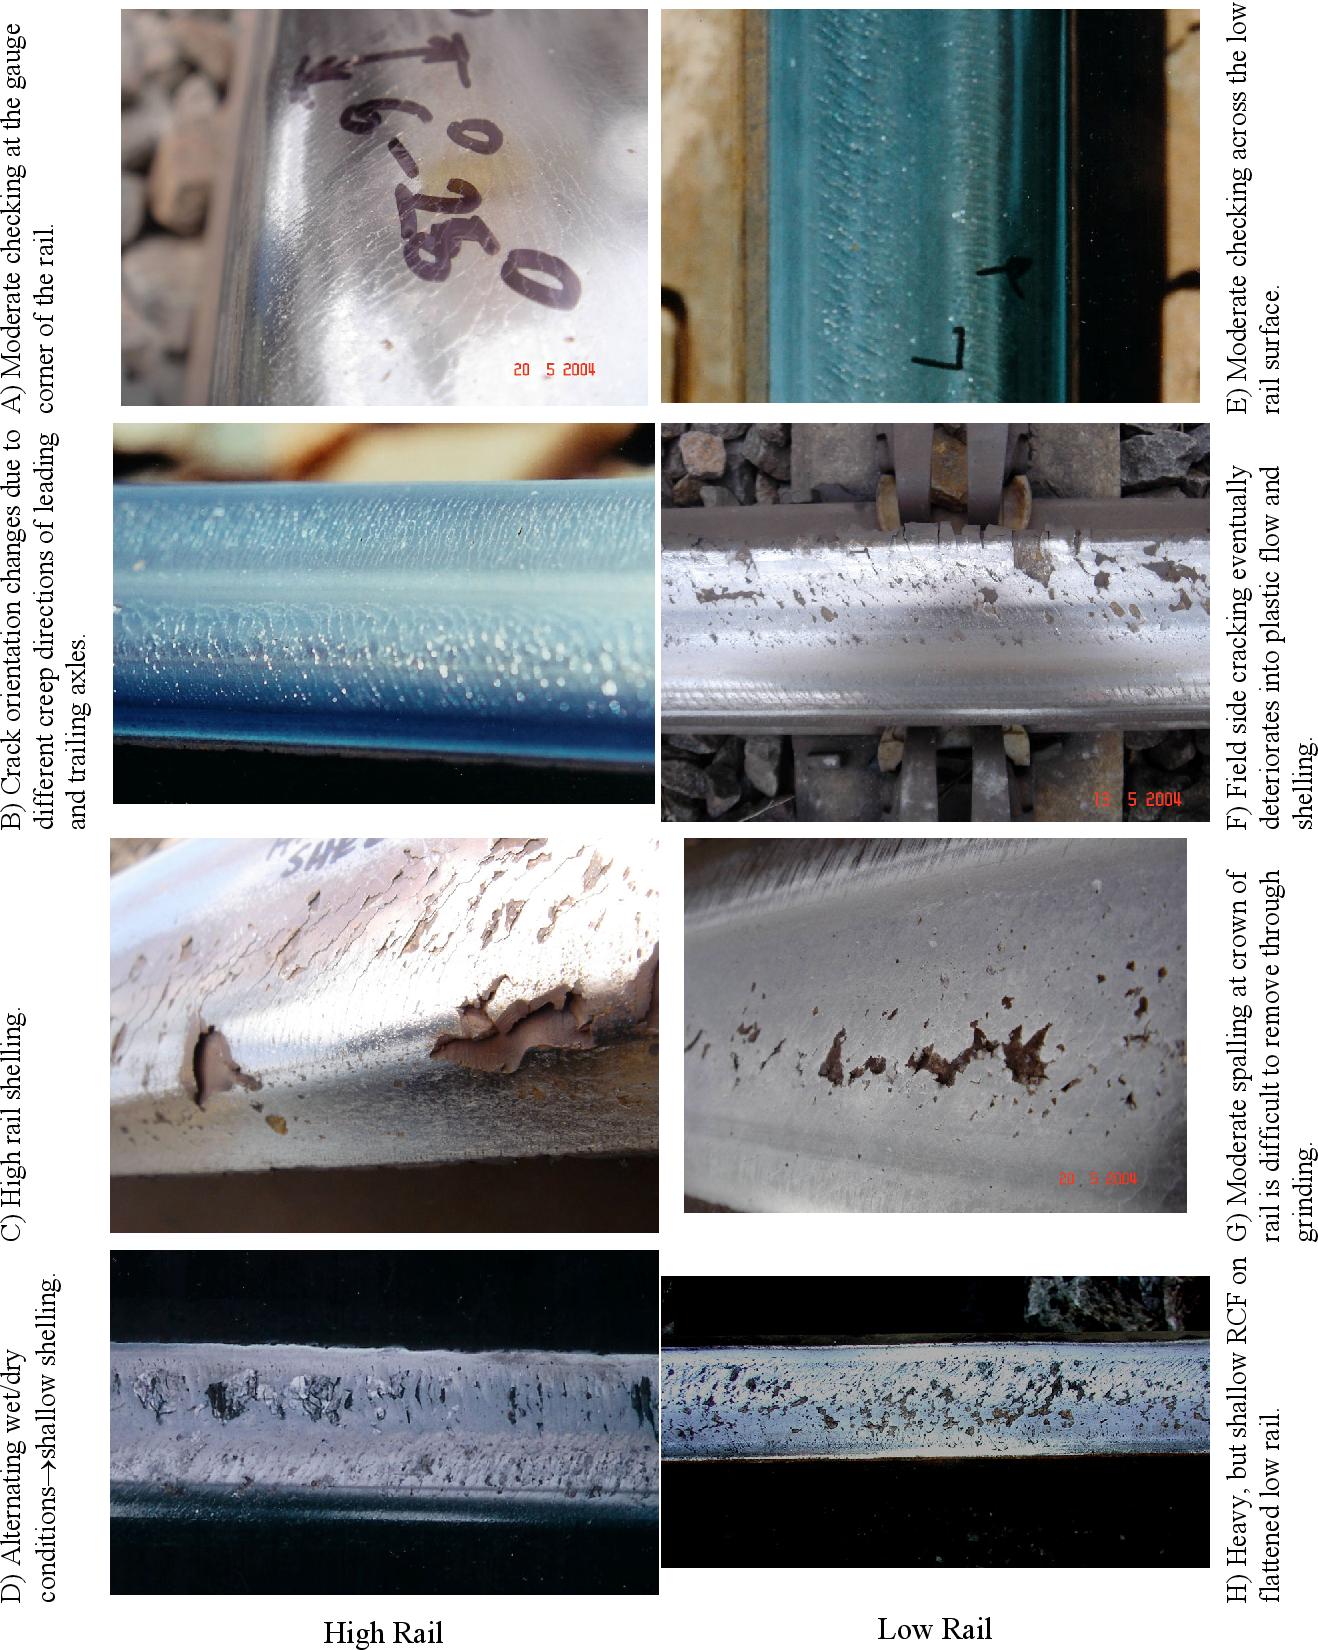 PDF] Kalousek 1 Control of Rolling Contact Fatigue of Rails